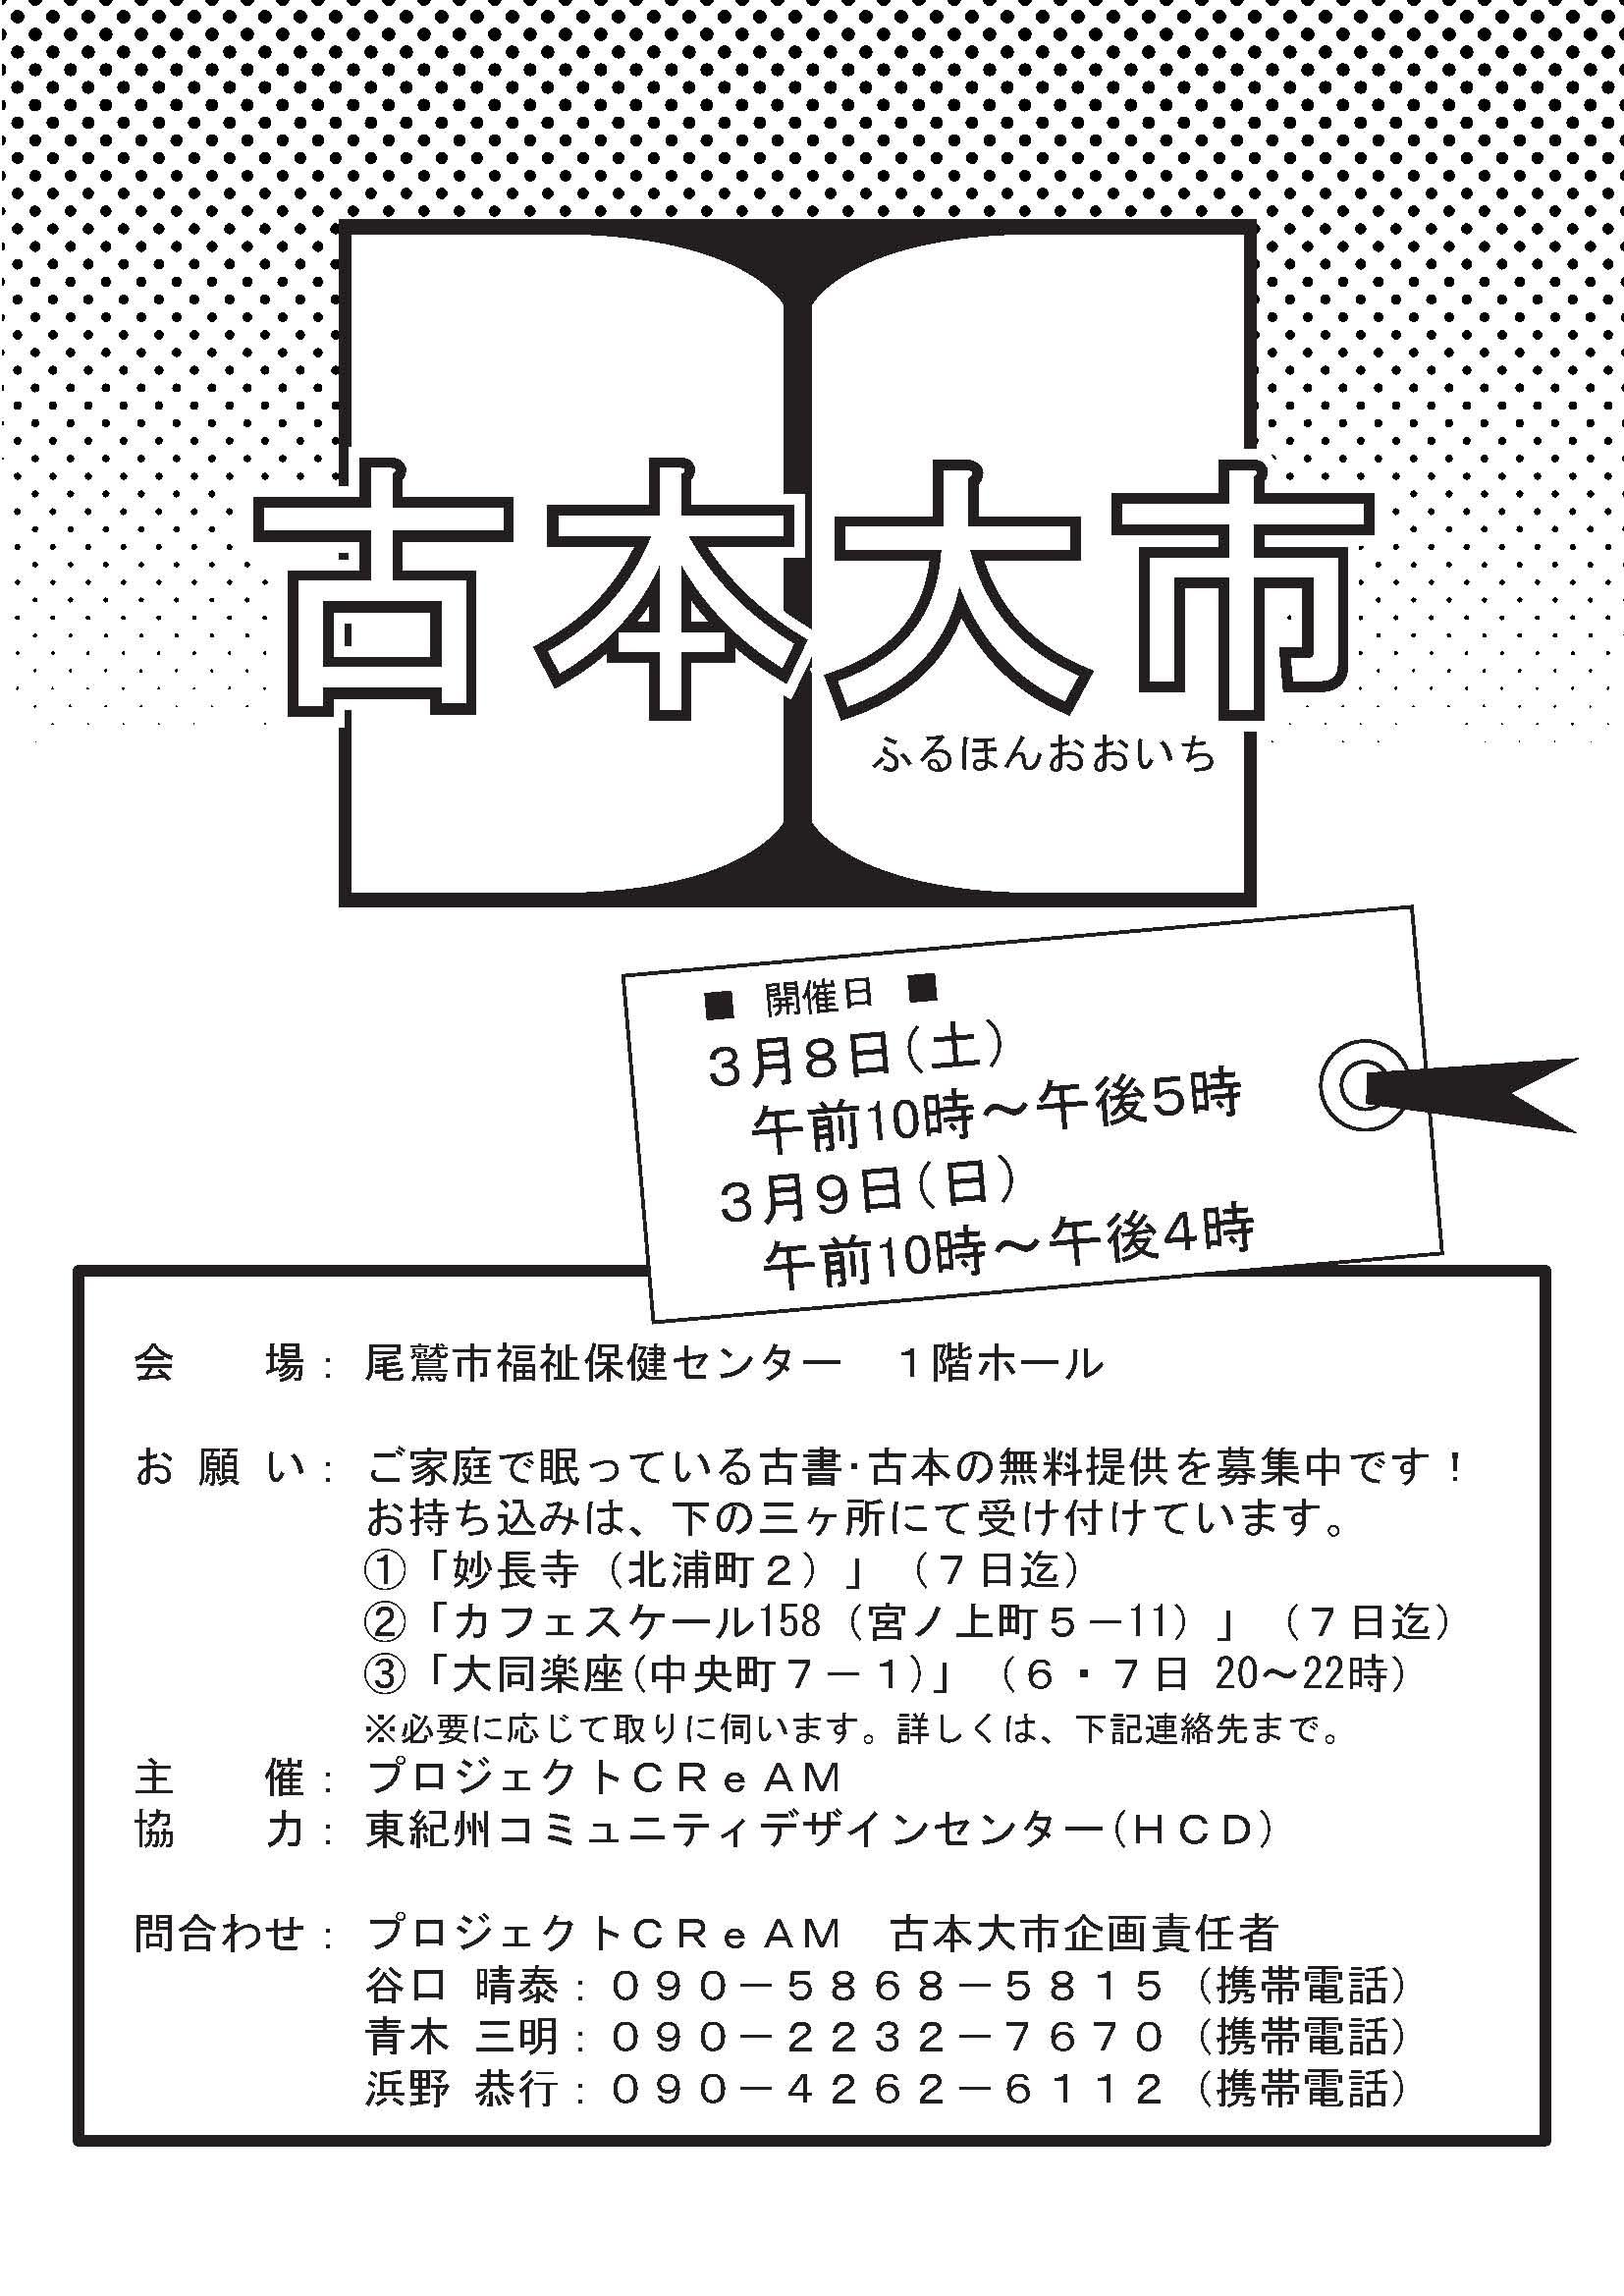 c0010936_1943676.jpg